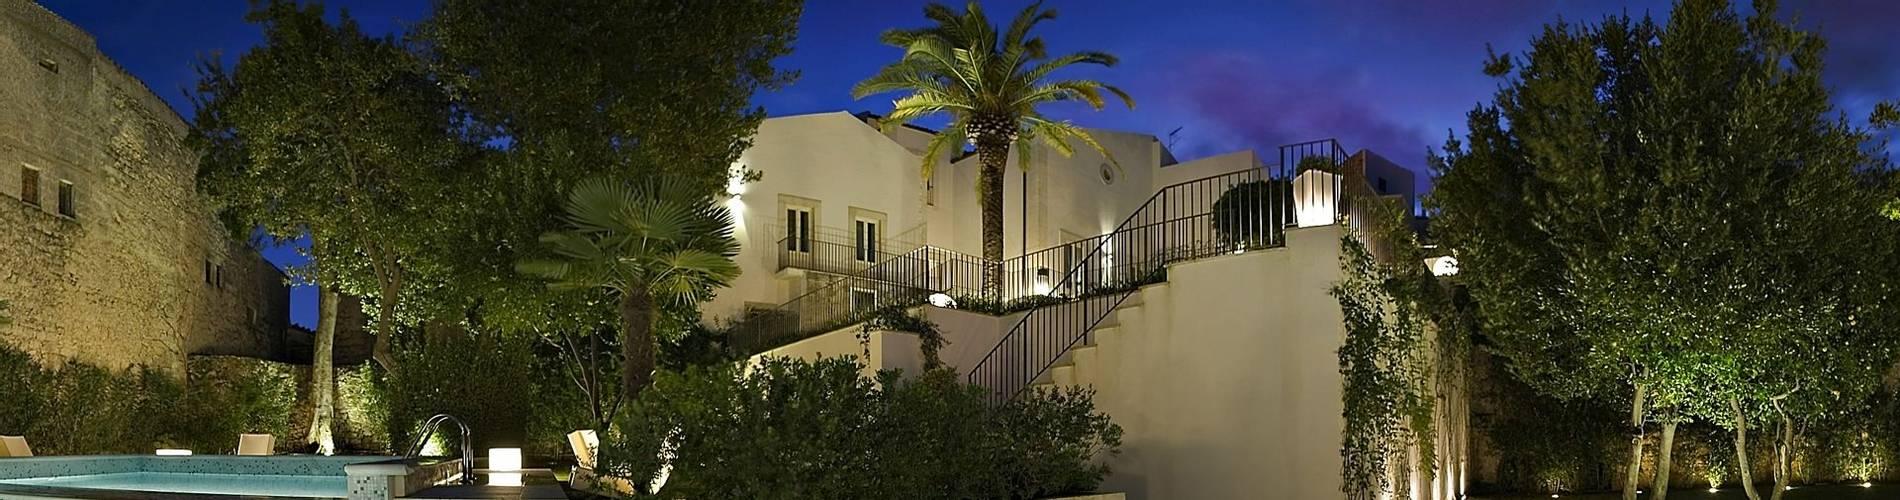 Villa Del Lauro, Sicily, Italy (8).jpg